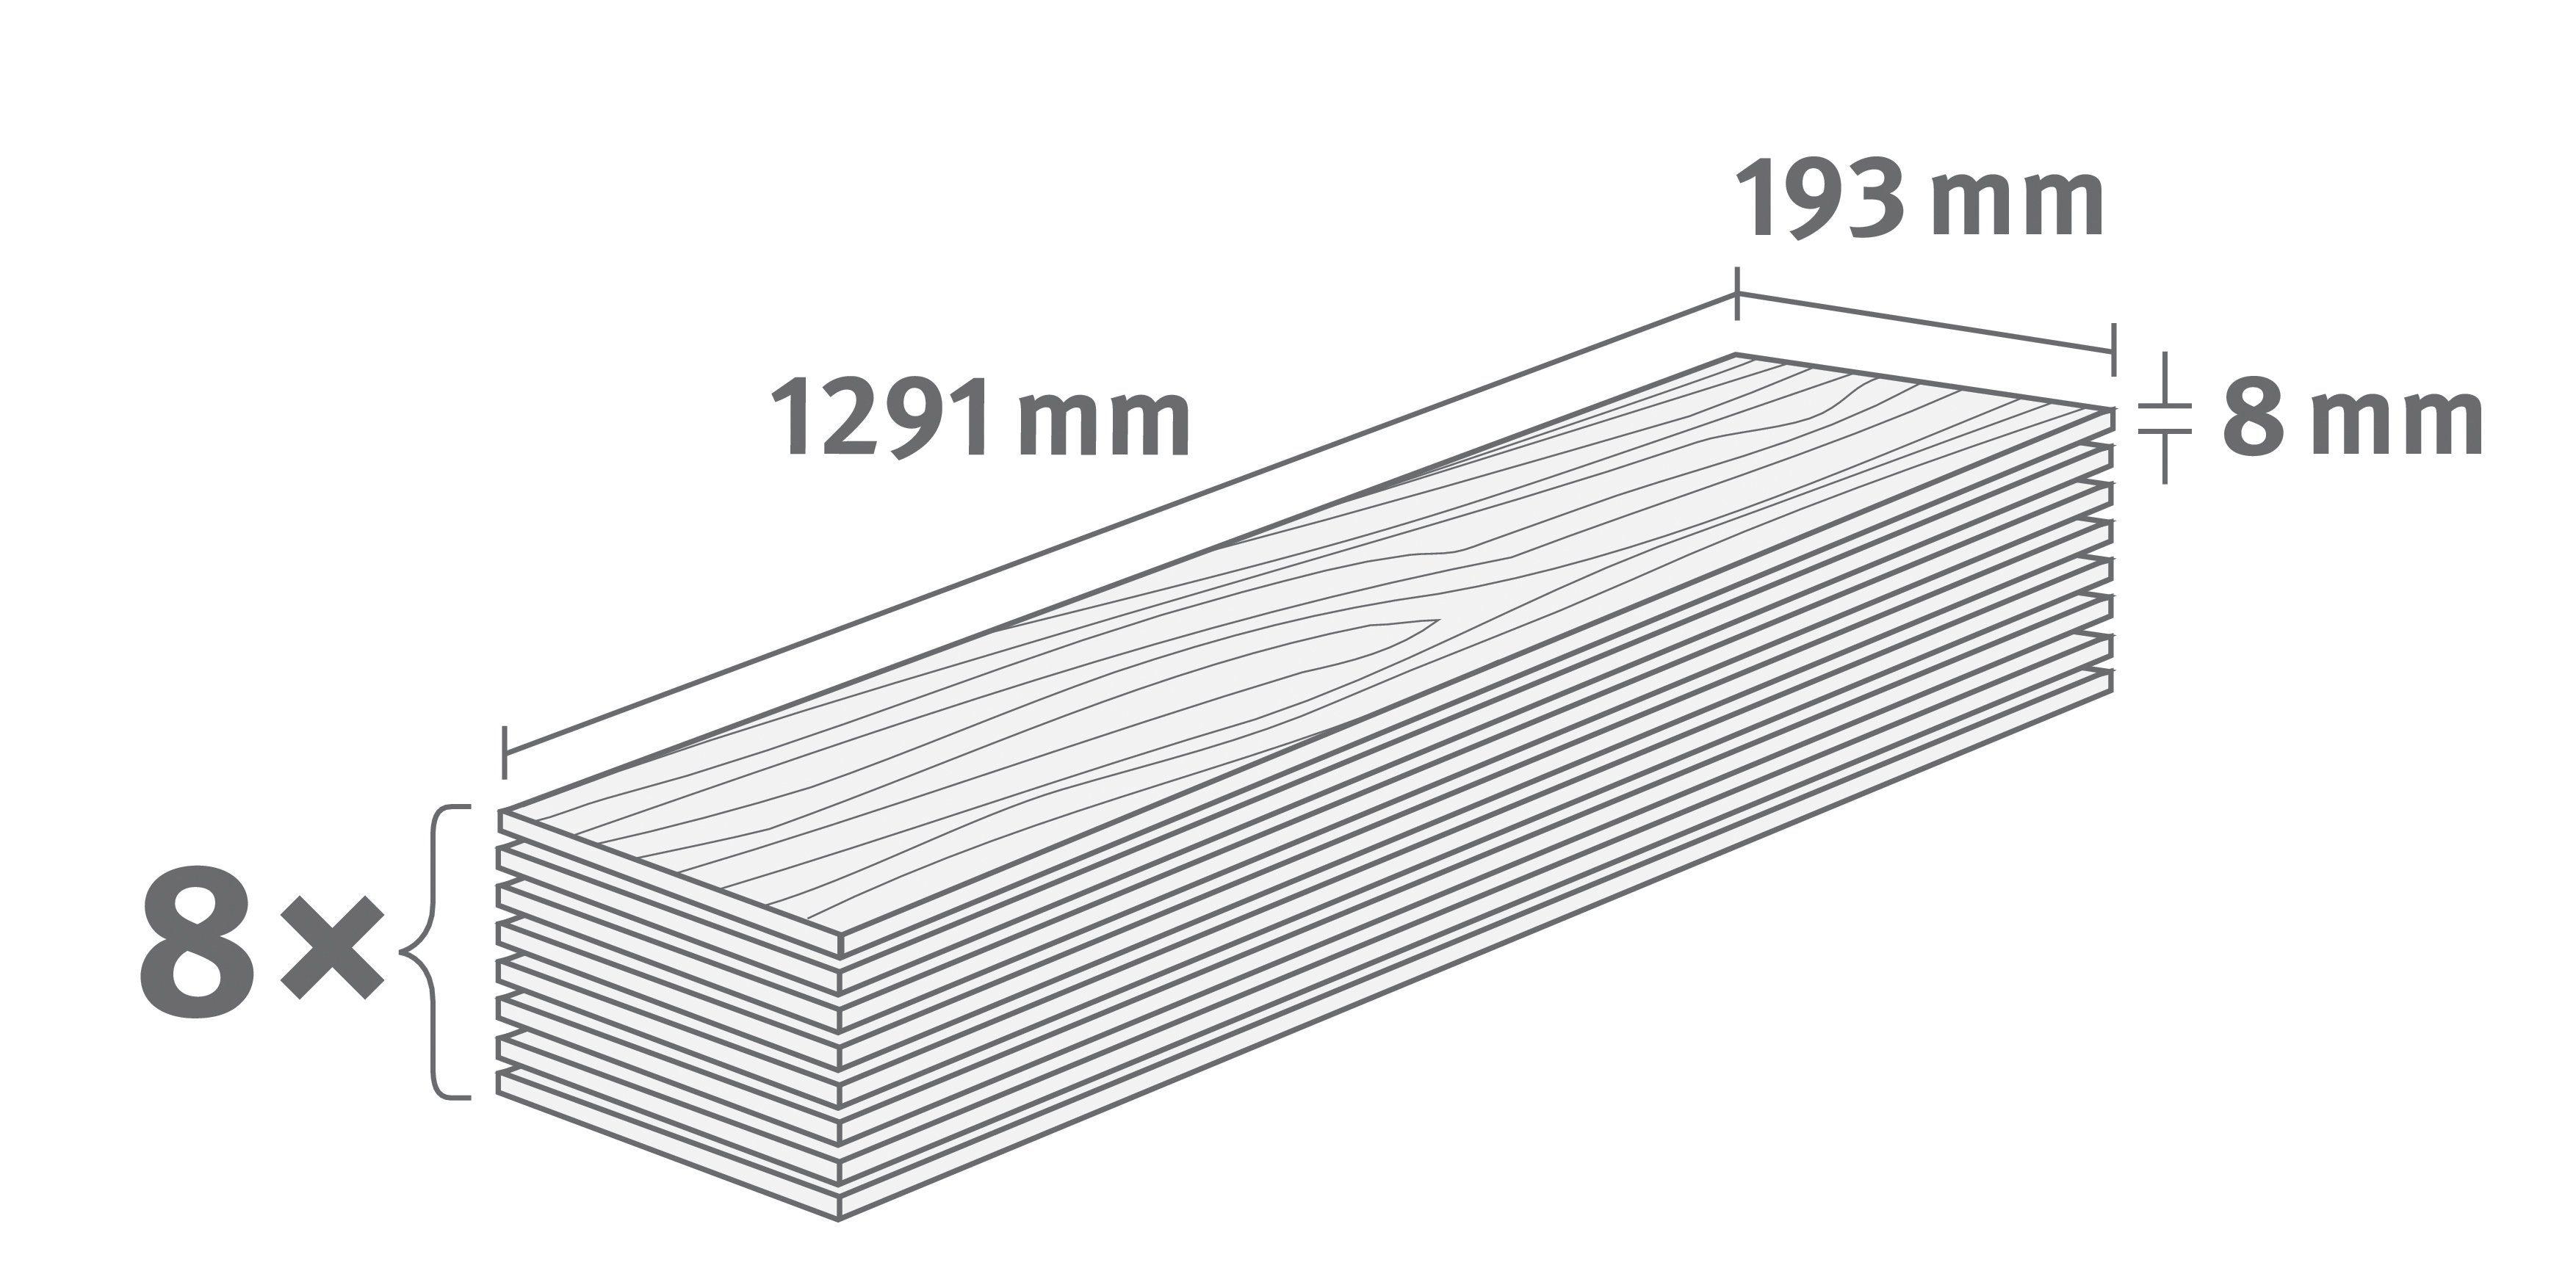 EGGER Laminat »EGGER HOME Aqua+ Perganti Nussbaum braun«, 1291 x 193 mm, Stärke: 8 mm